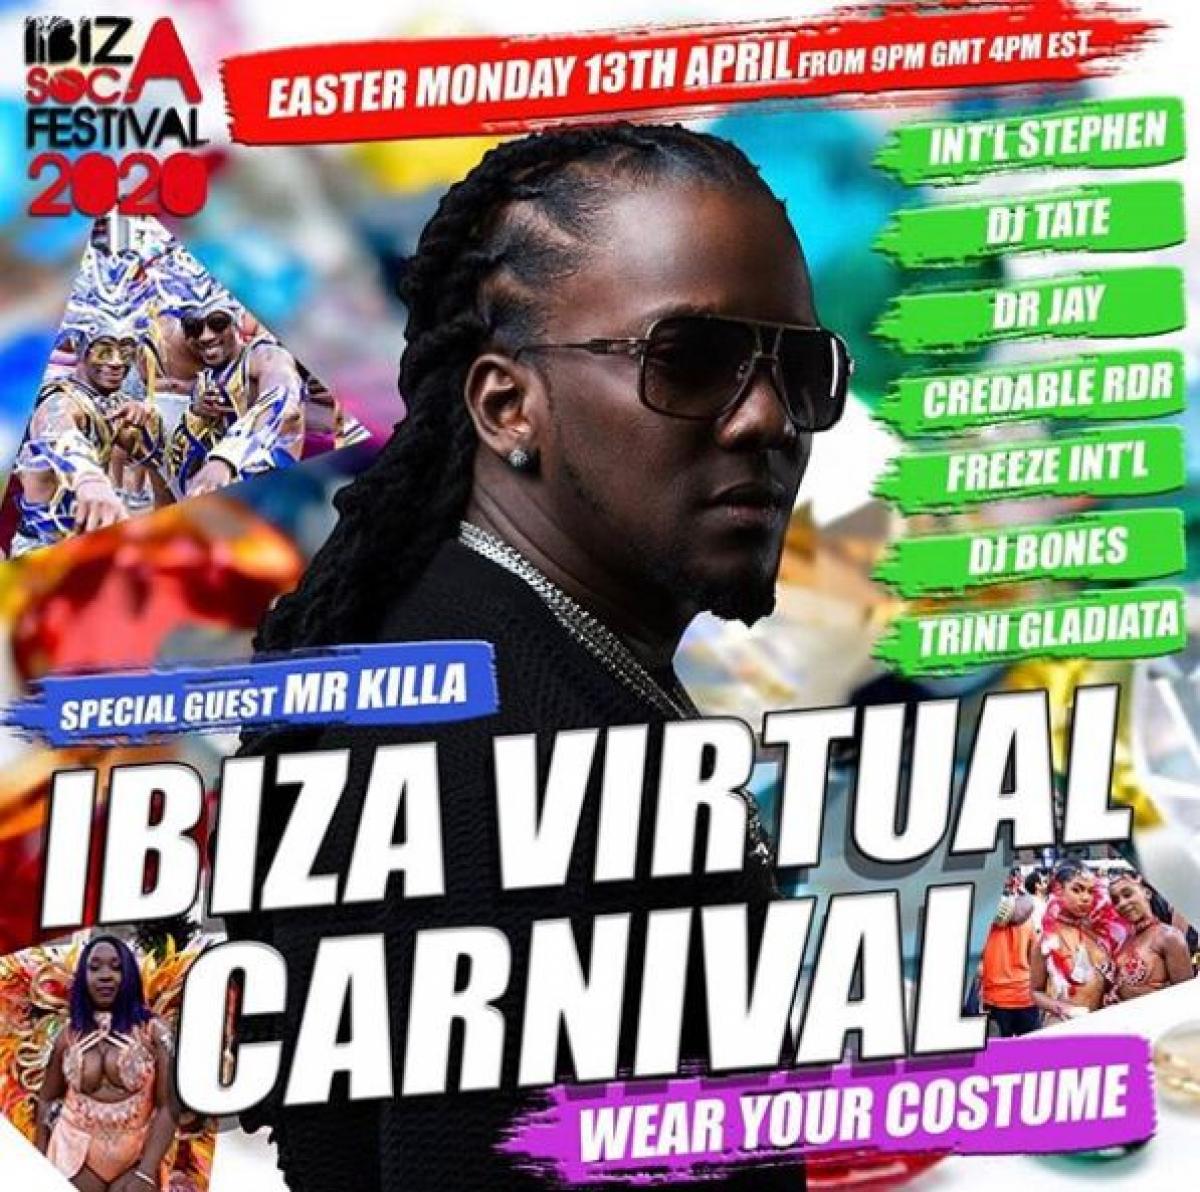 Ibiza Virtual Carnival flyer or graphic.